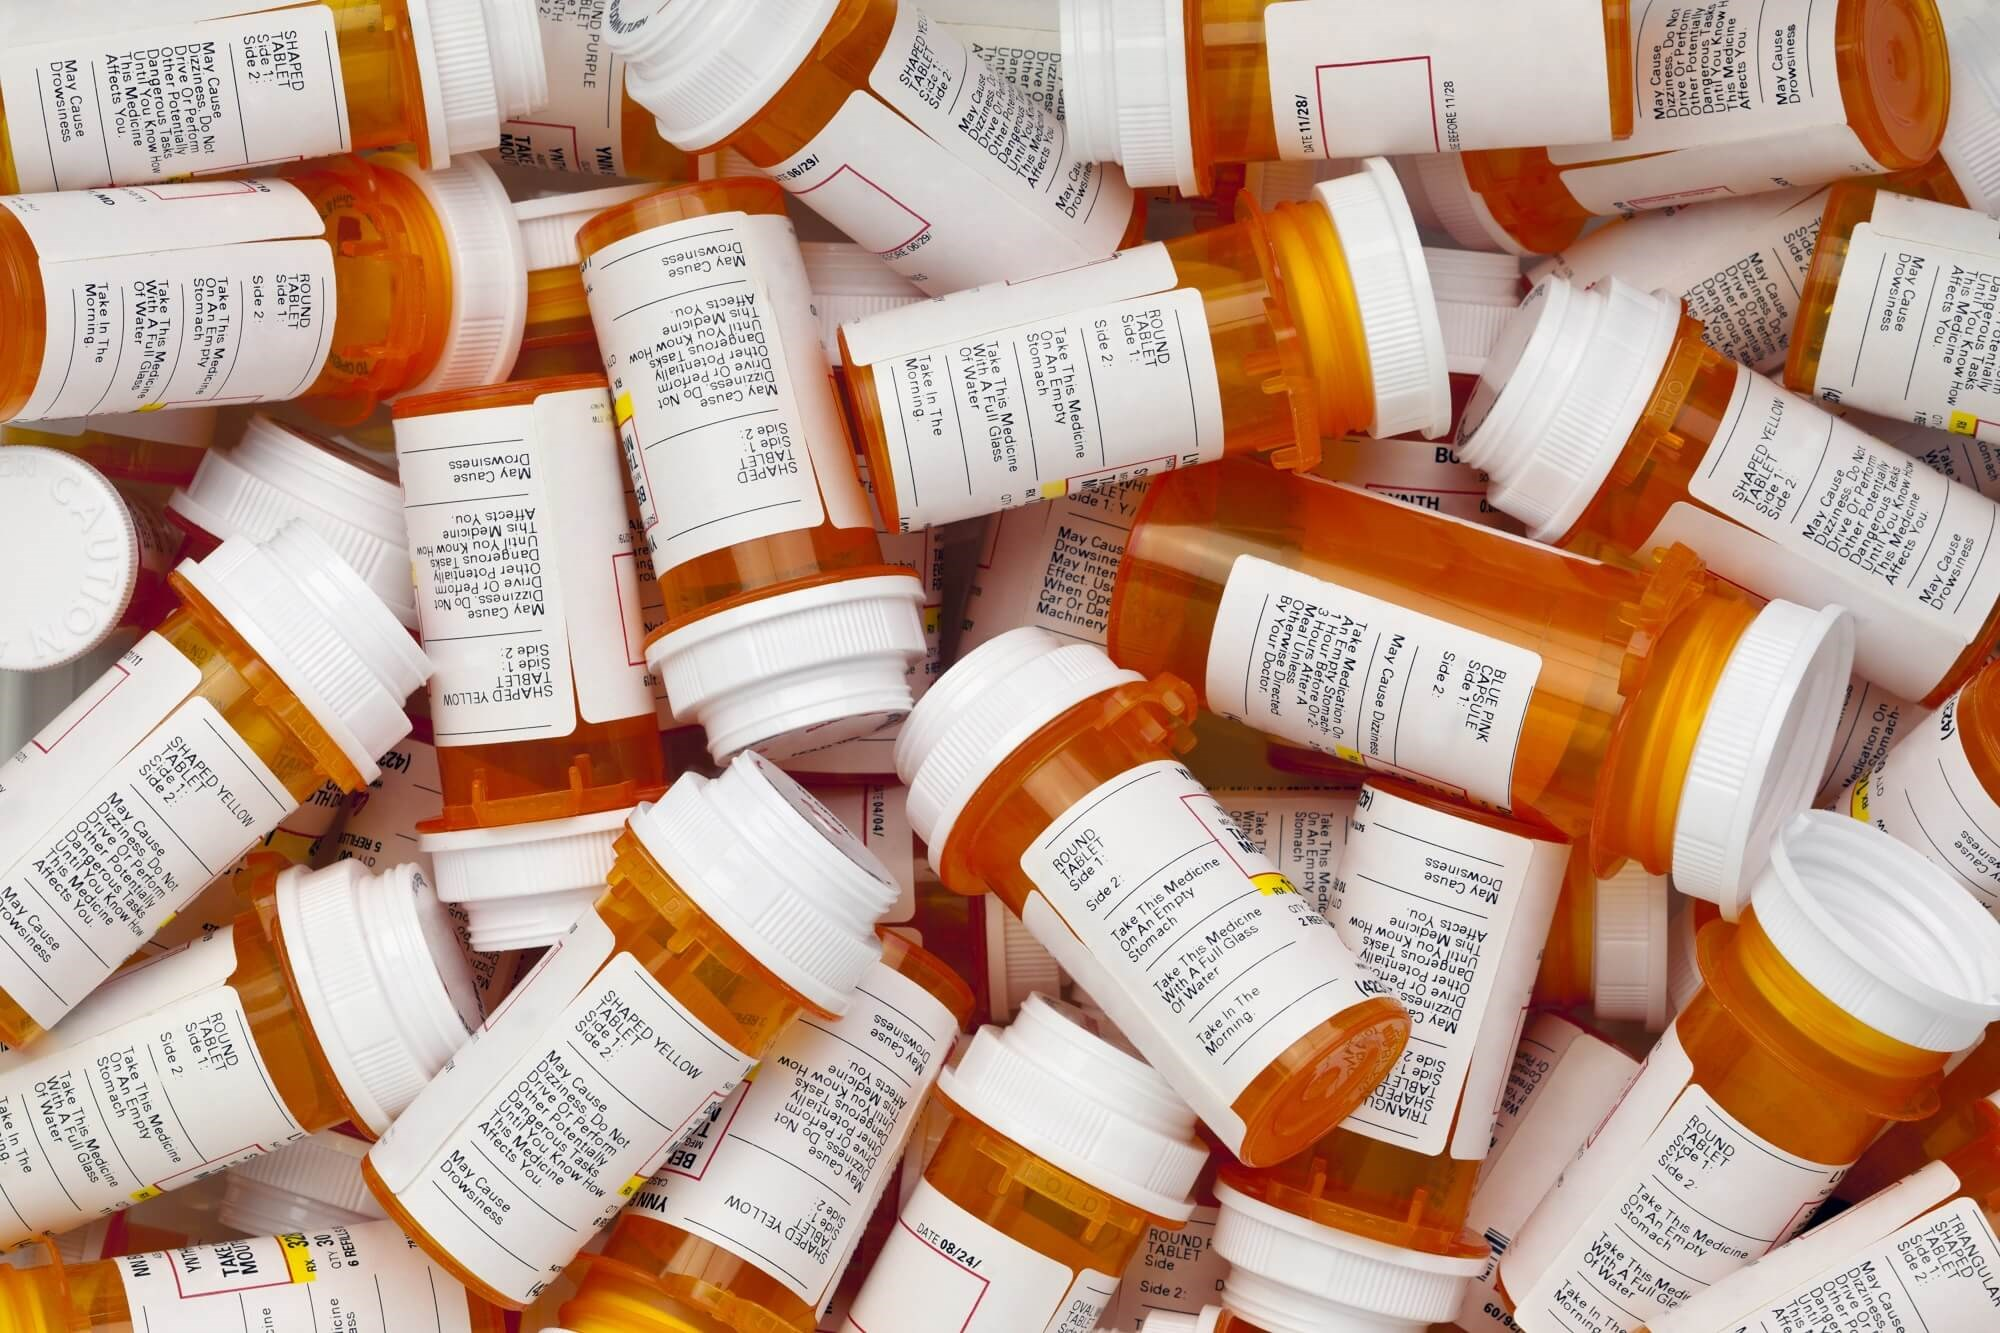 DOAC Safety, Efficacy Similar to Warfarin for Nonvalvular Atrial Fibrillation